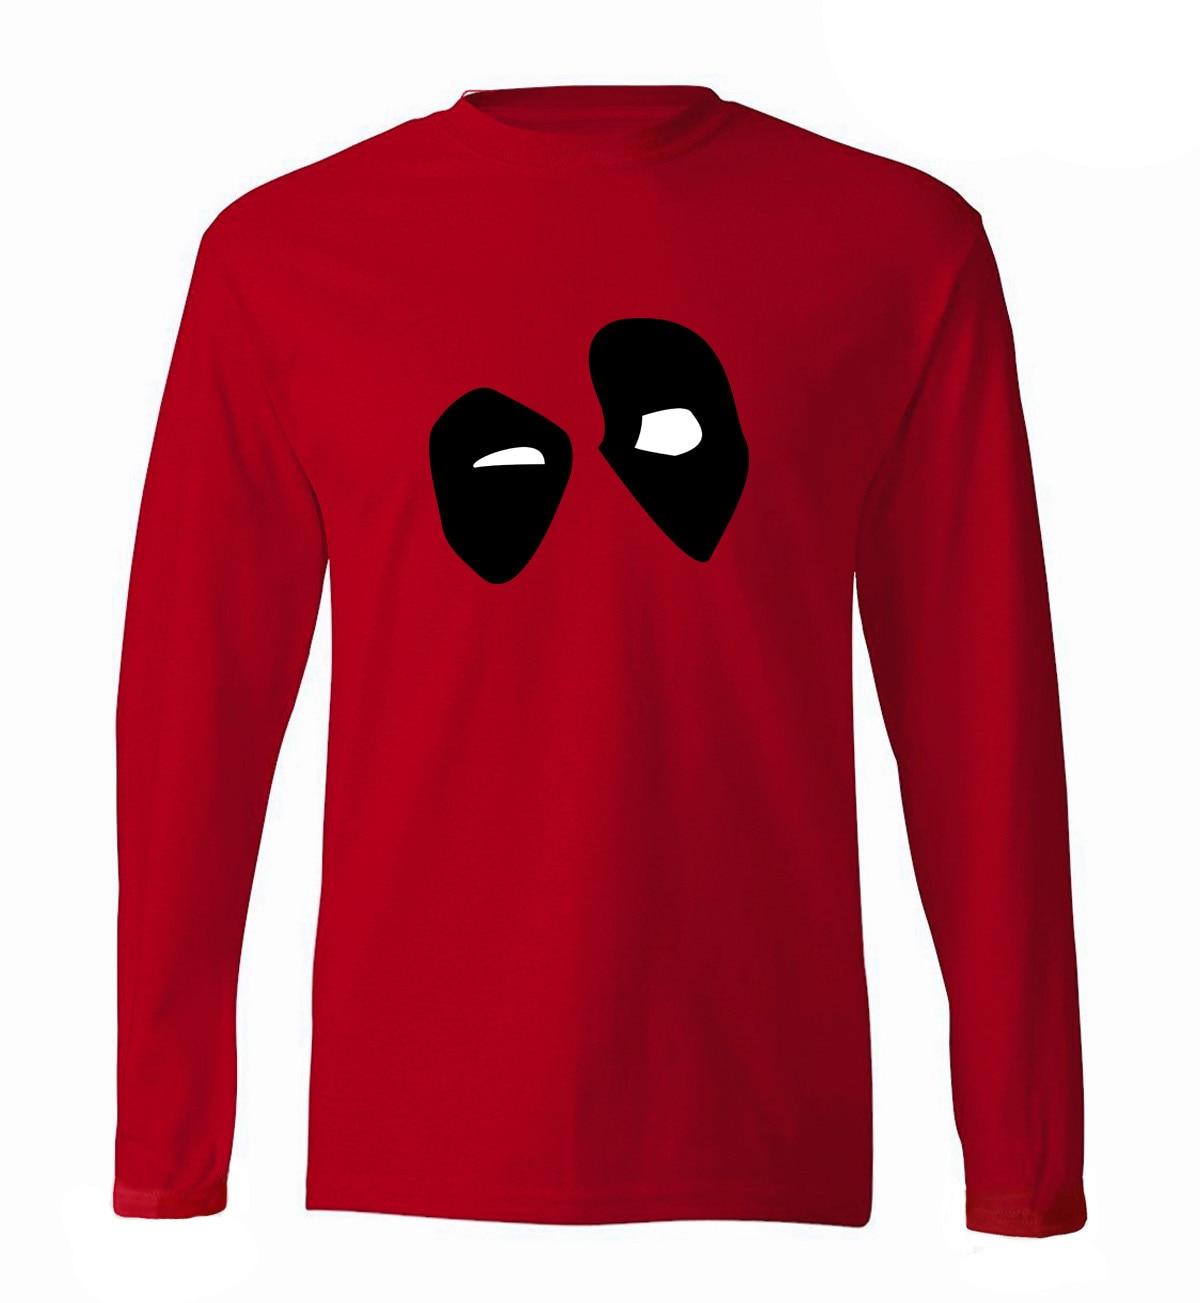 Hero Deadpool men long sleeve o-neck t-shirts 2019 spring new 100% cotton fitness brand clothing Deadpool hip hop man top tees